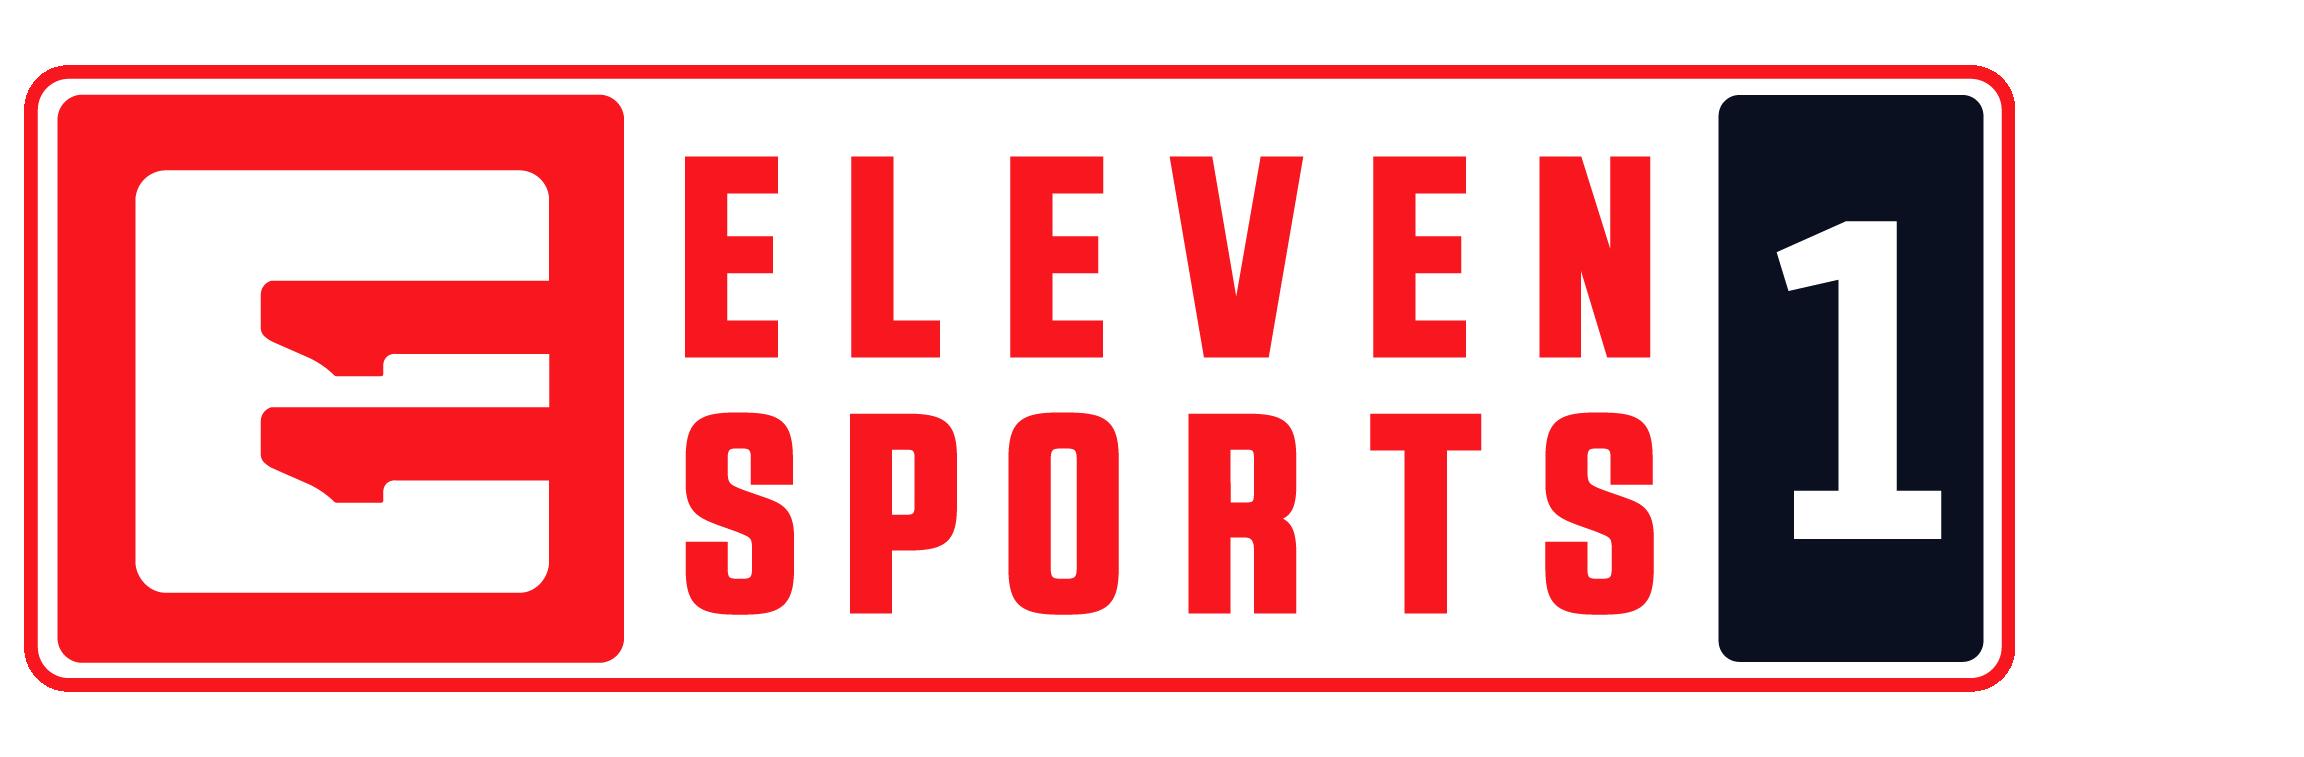 Eleven Sports 2